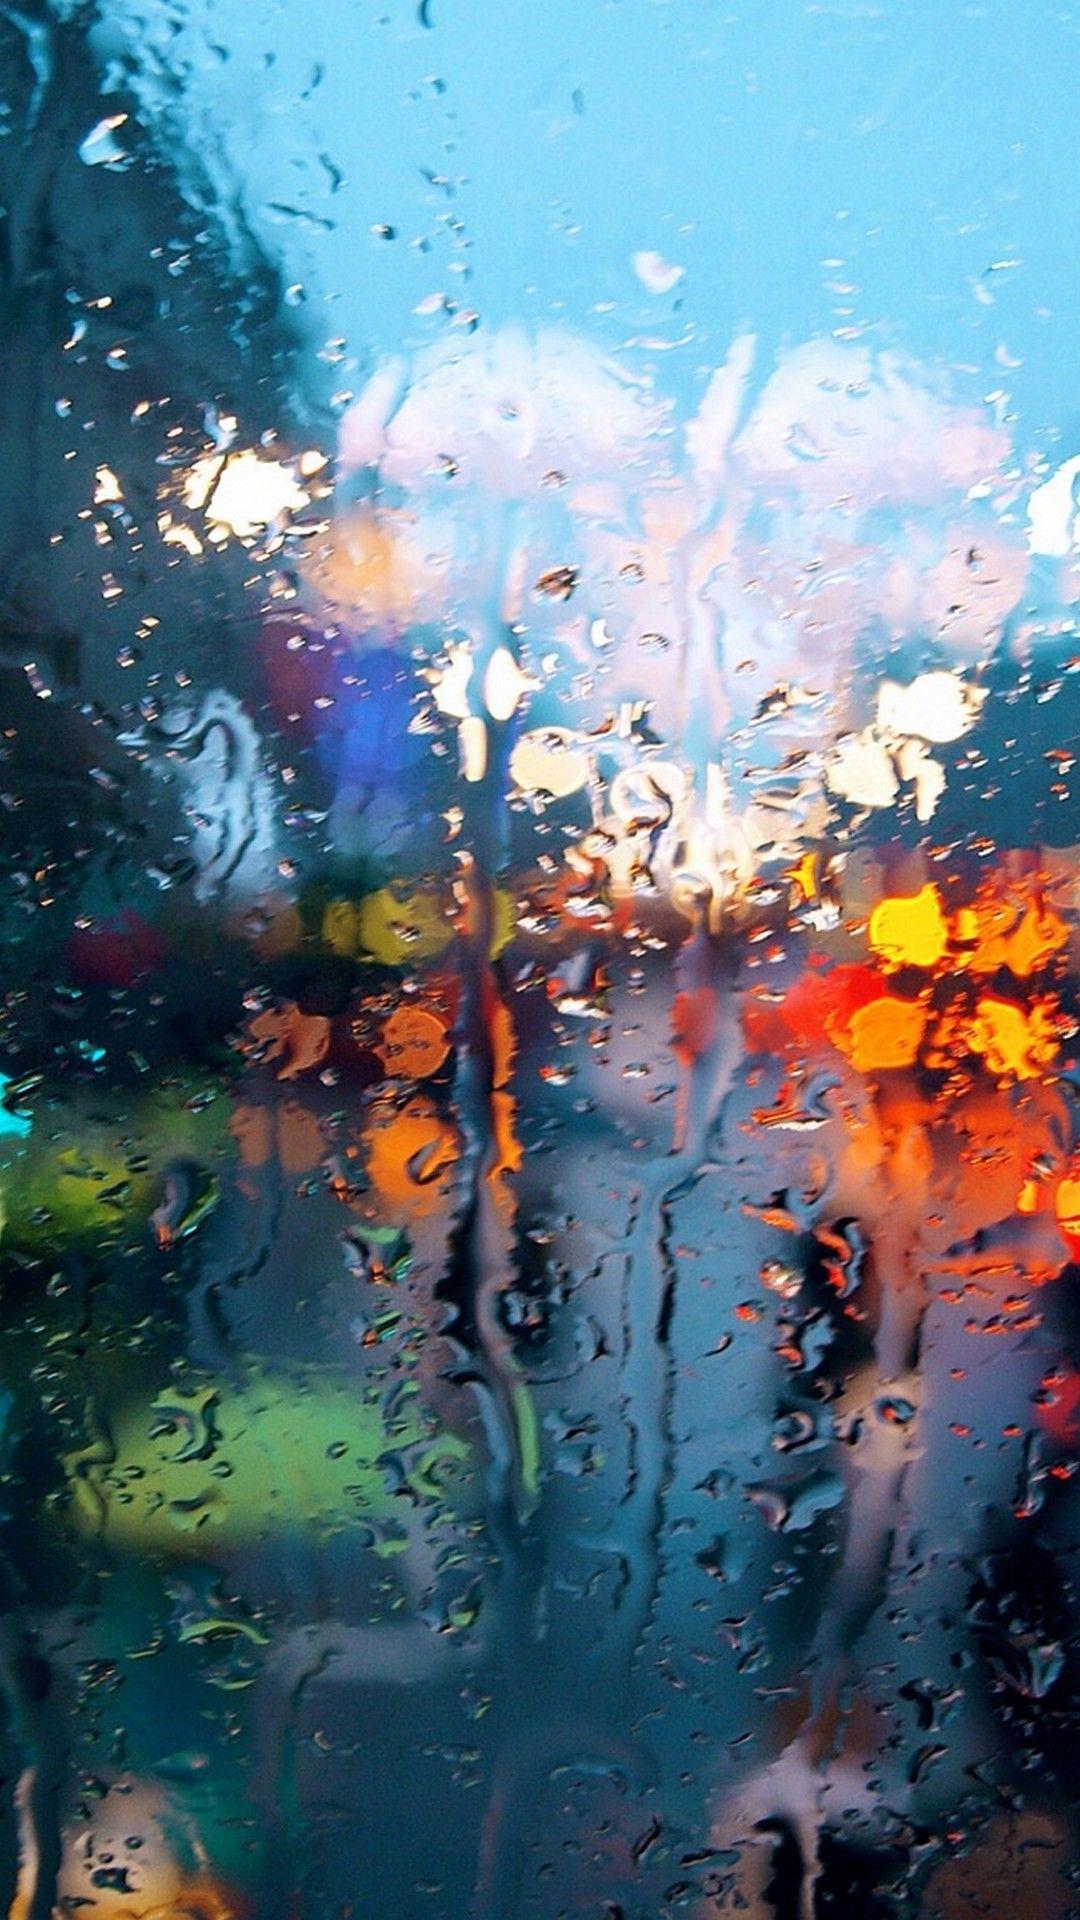 Raindrop Wallpaper Iphone 5 Rain Wallpapers Iphone Background